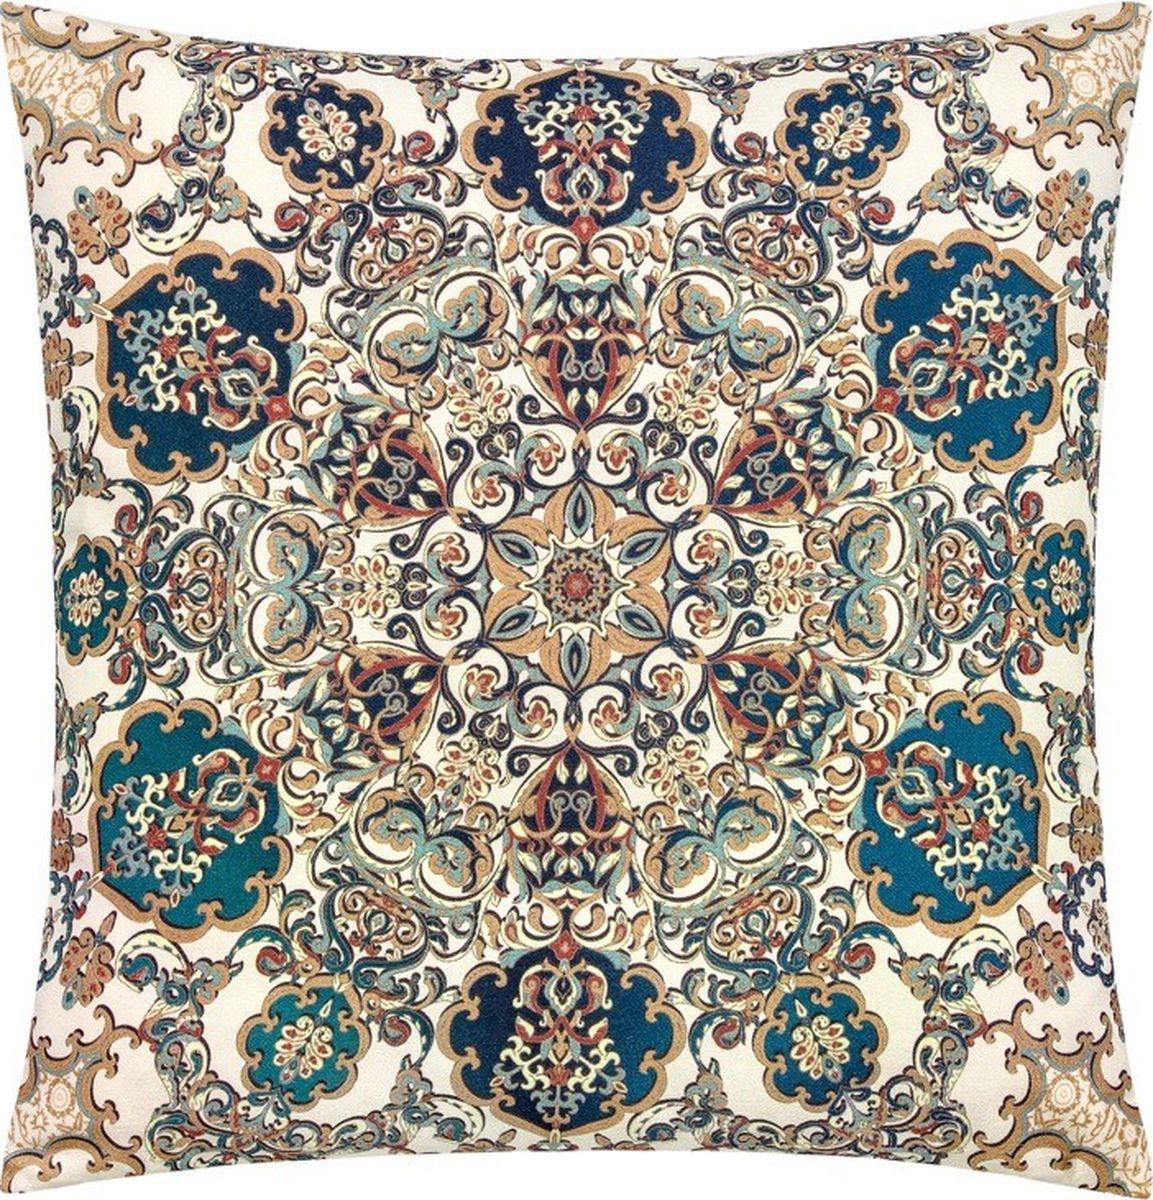 Подушка декоративная Togas Эден, 45 х 45 см40.16.70.0271